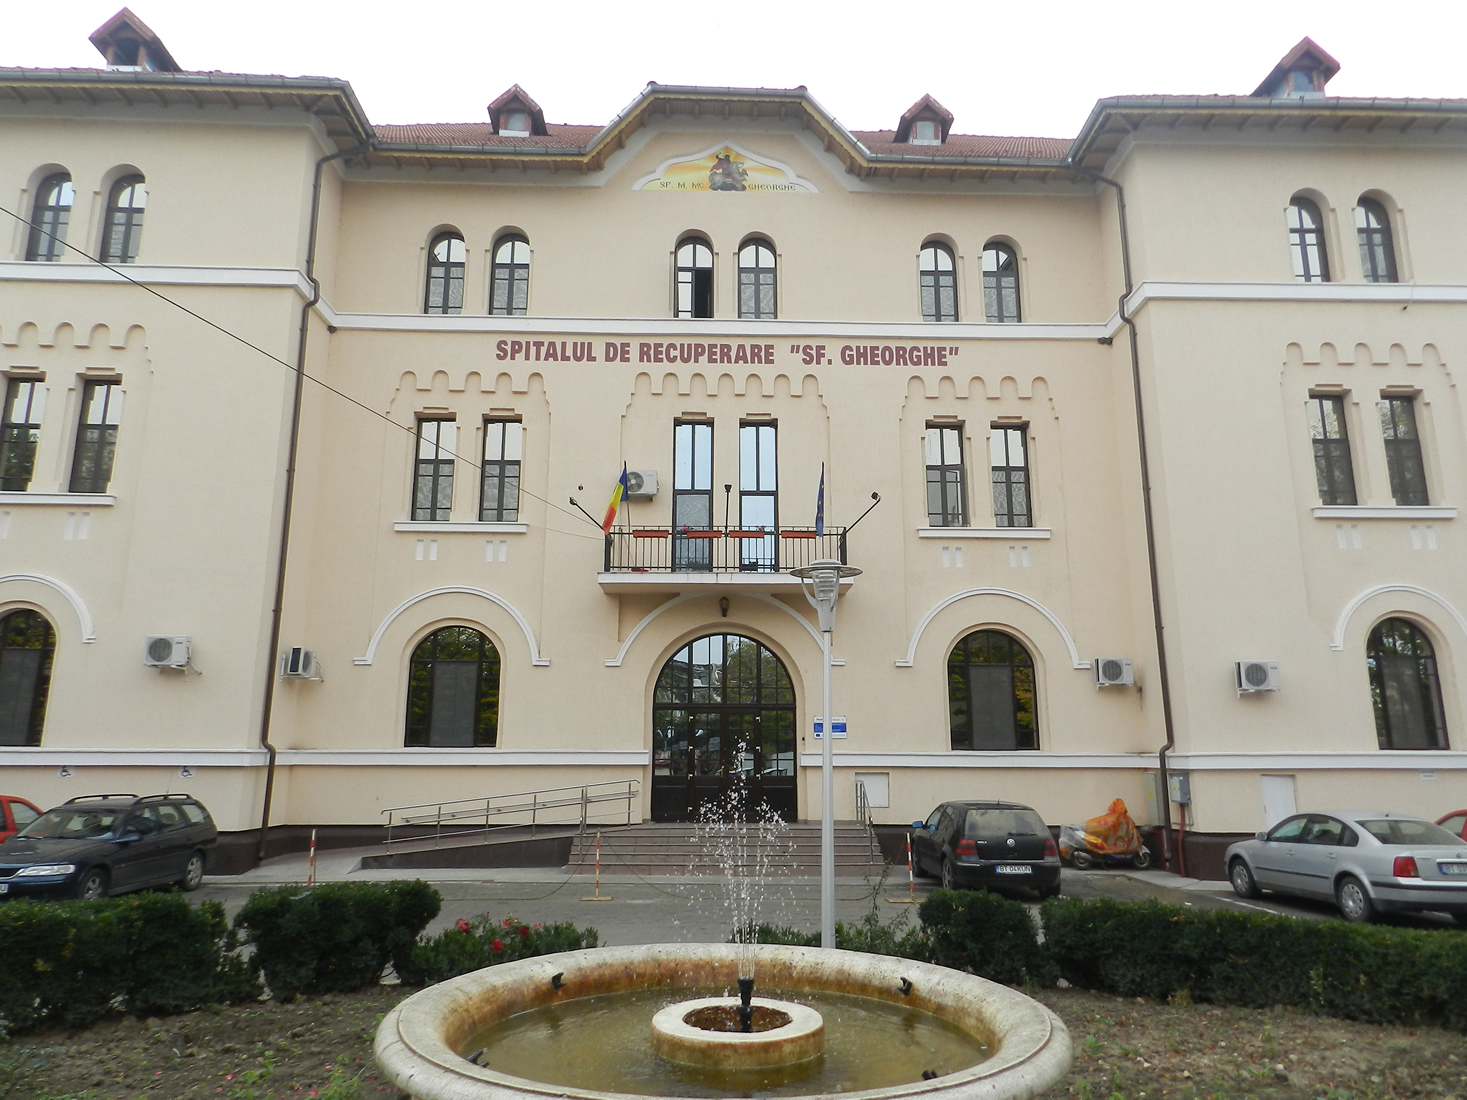 http://www.spitalbt-sfgheorghe.ro/foto/spital/01.JPG